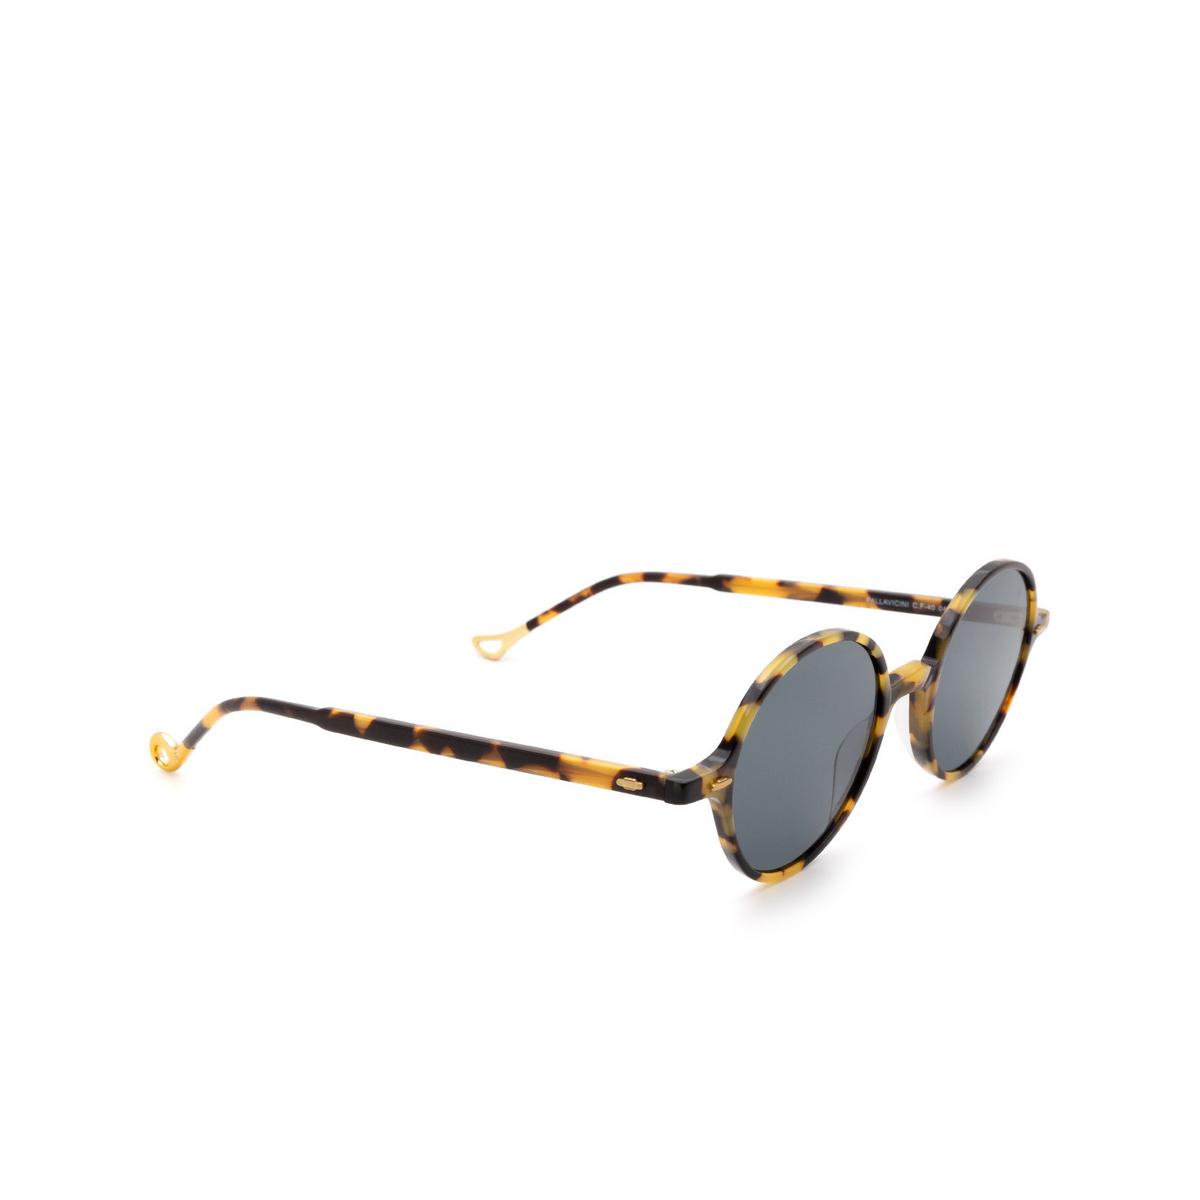 Eyepetizer® Round Sunglasses: Pallavicini color Havana C.F-40.